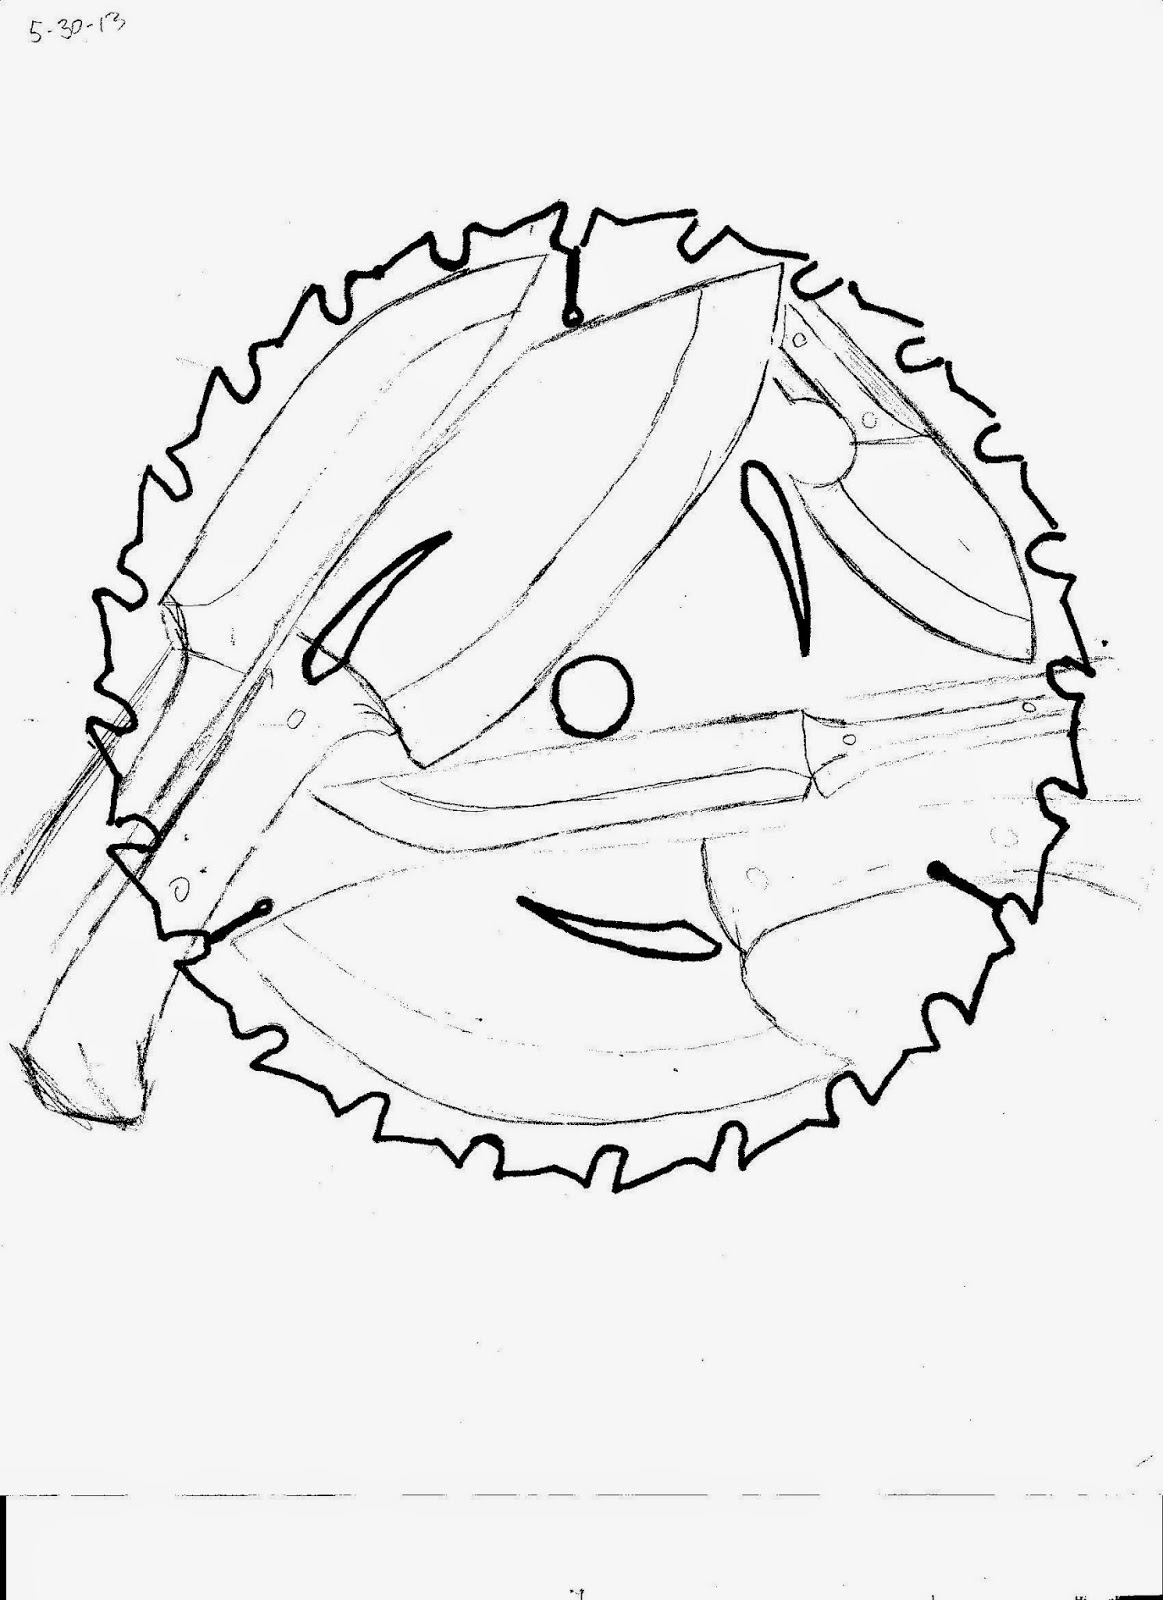 1163x1600 Blackheart Forge Circular Saw Blade Knife Concept